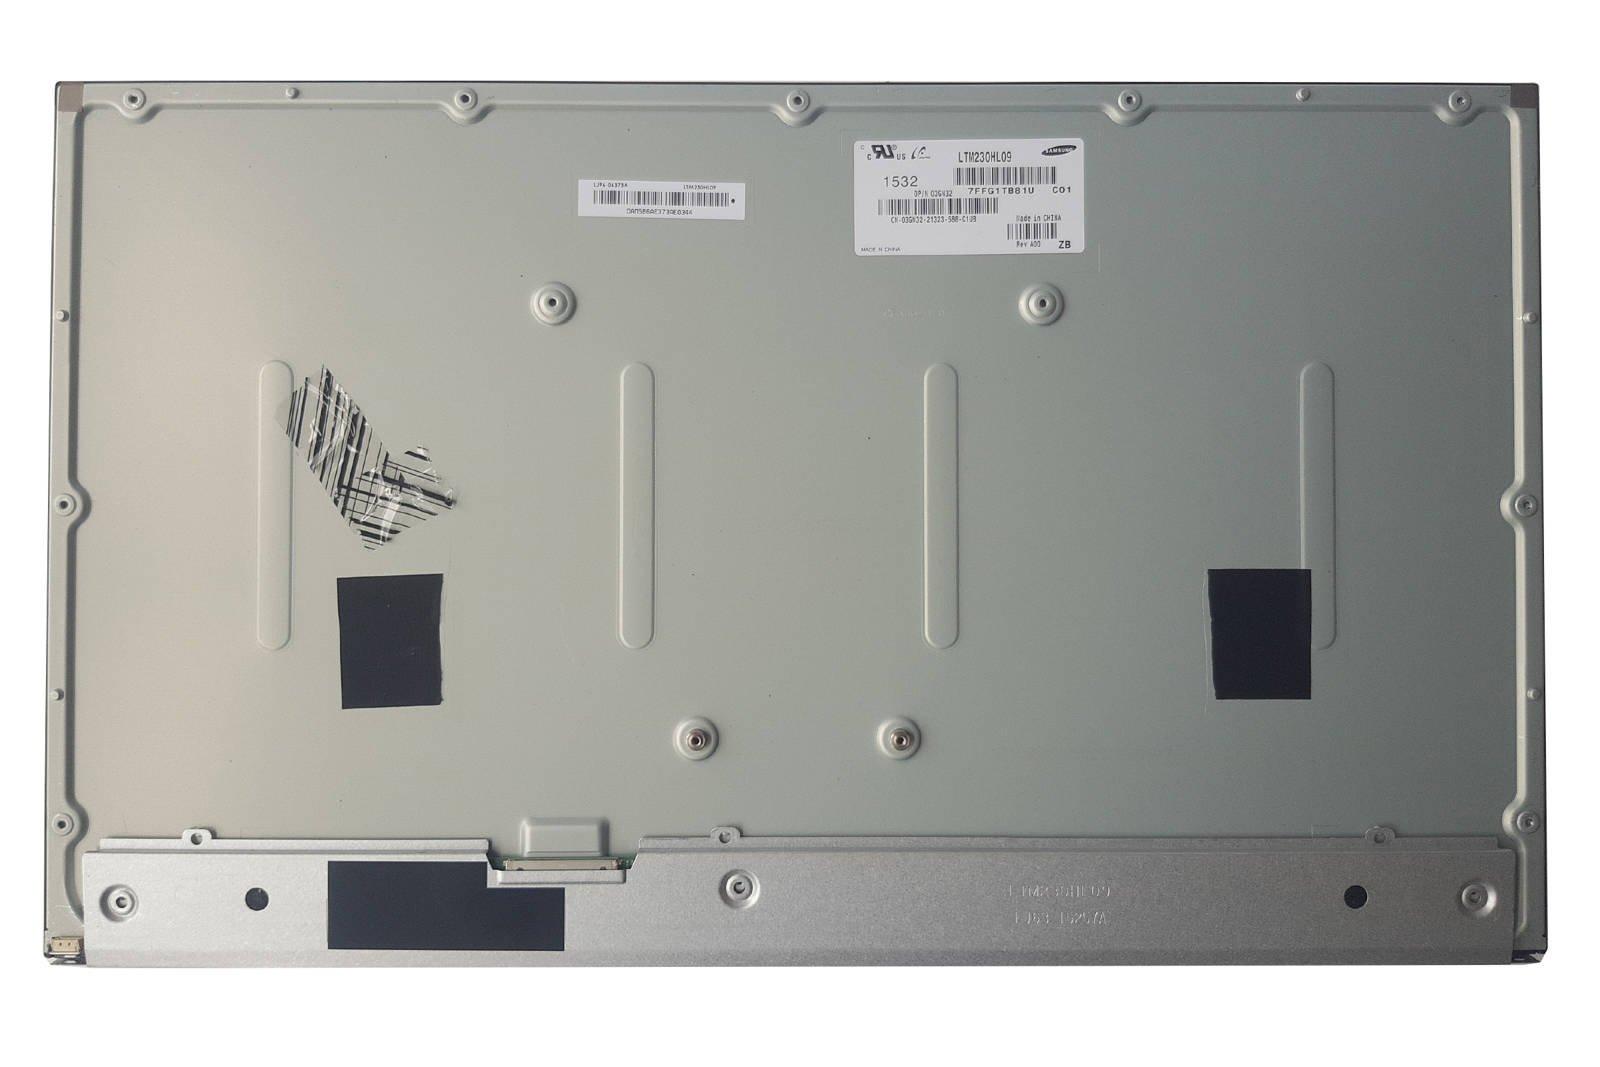 Bildschirm Samsung 23.0' LTM230HL09 FullHD